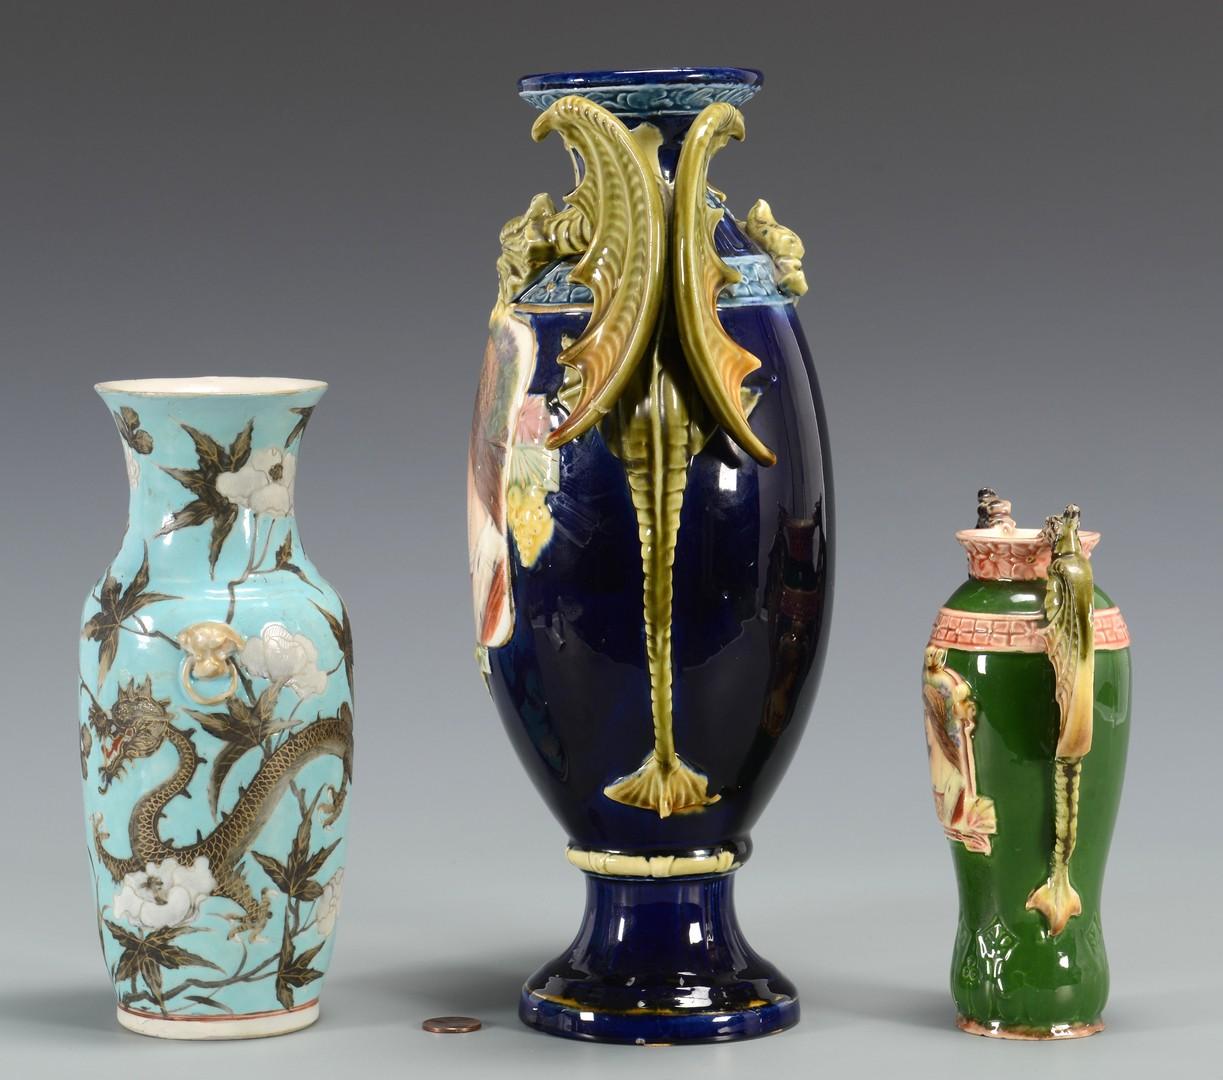 Lot 3594255: 3 Vases inc. Majolica dragon portrait vases